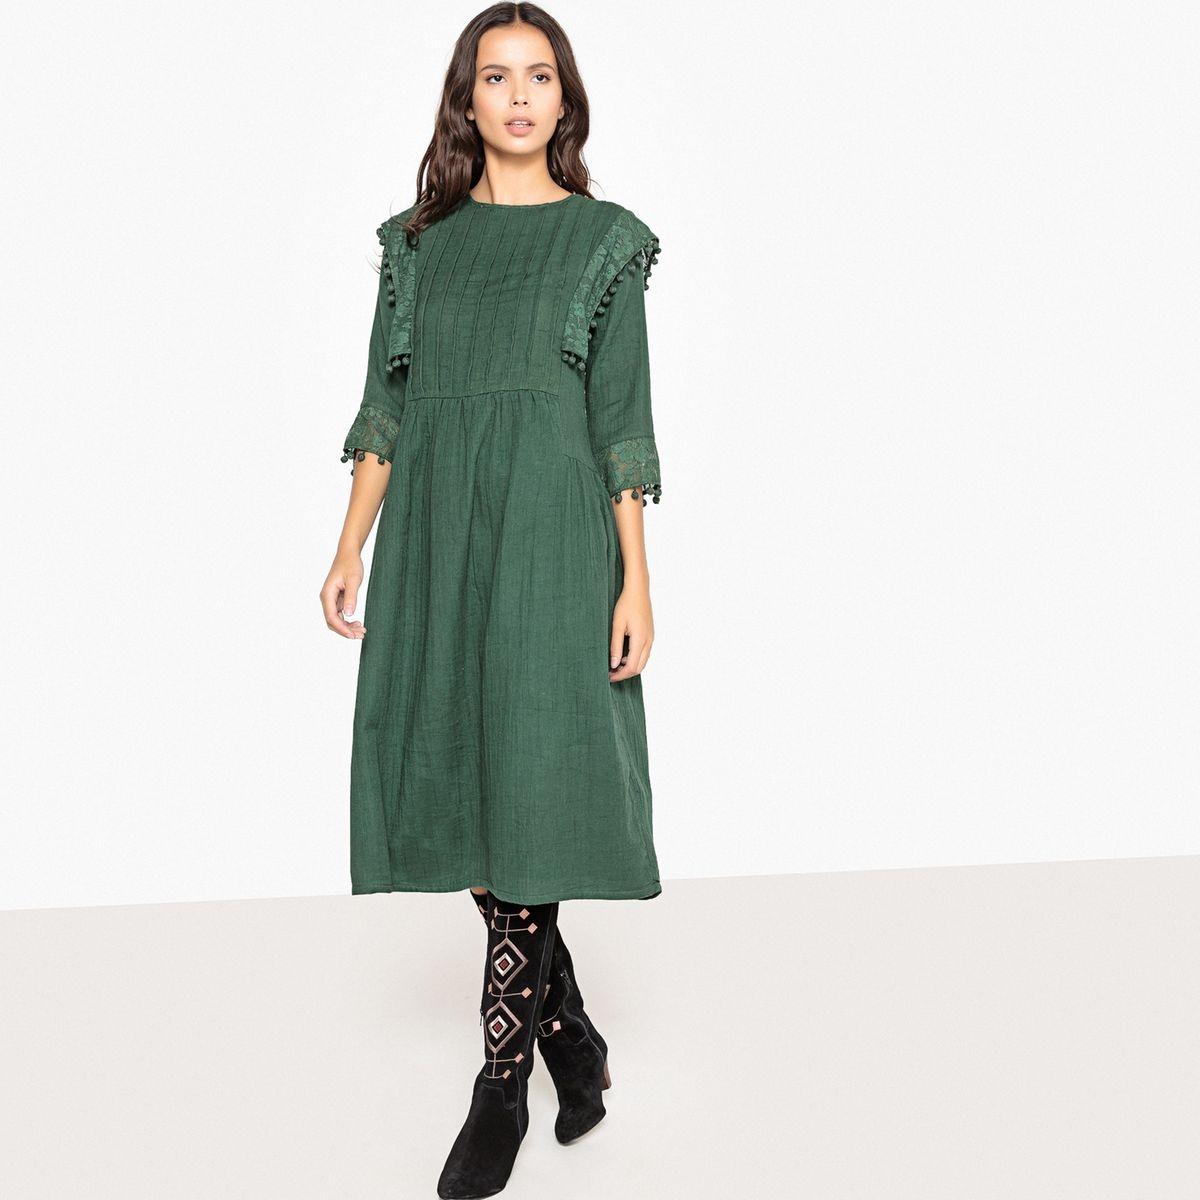 Robe midi style folk, avec plis et pompons